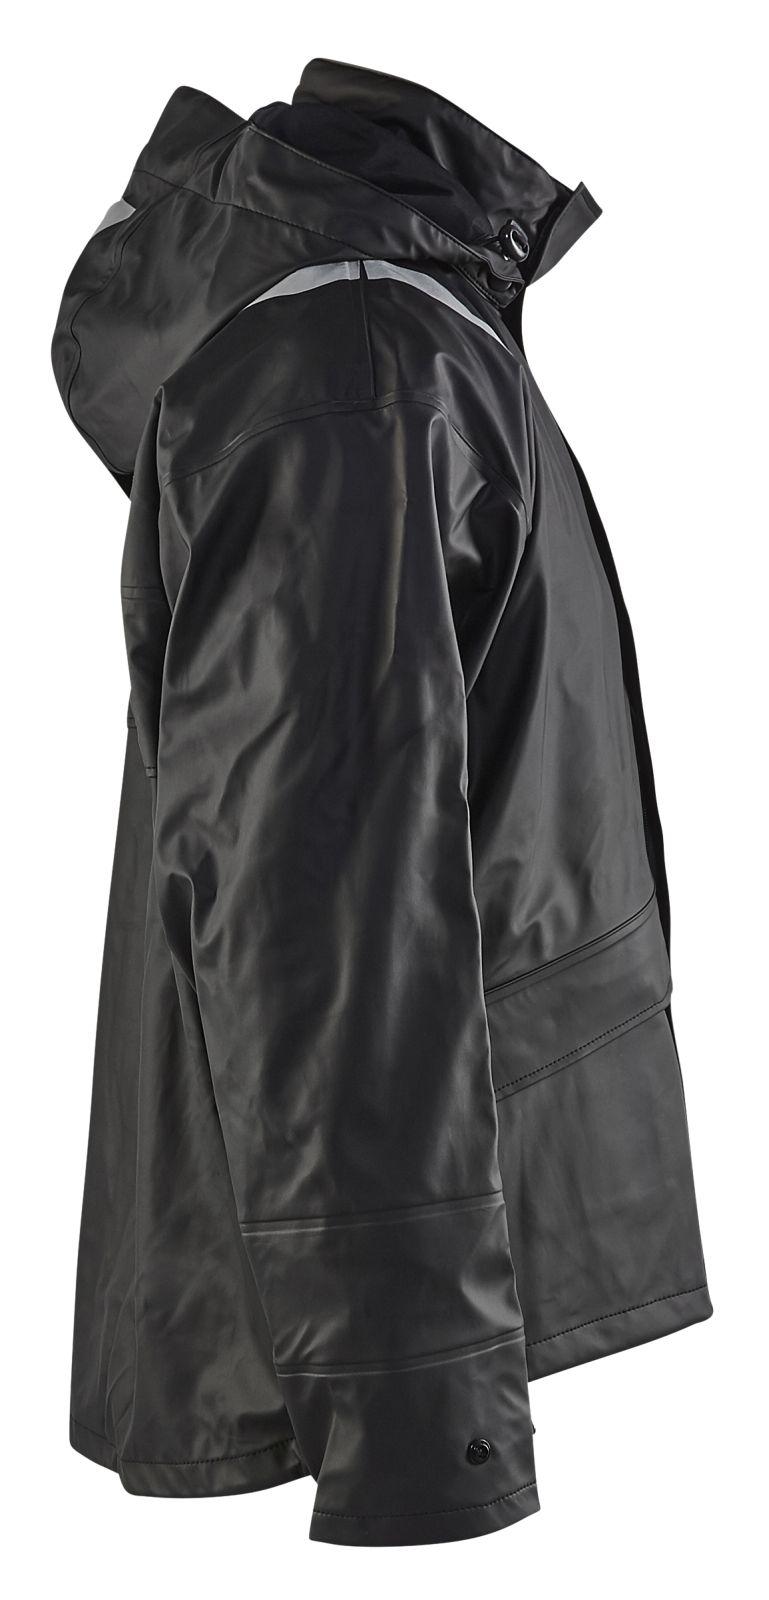 Blaklader Regenjacks 43022003 High Vis zwart(9900)